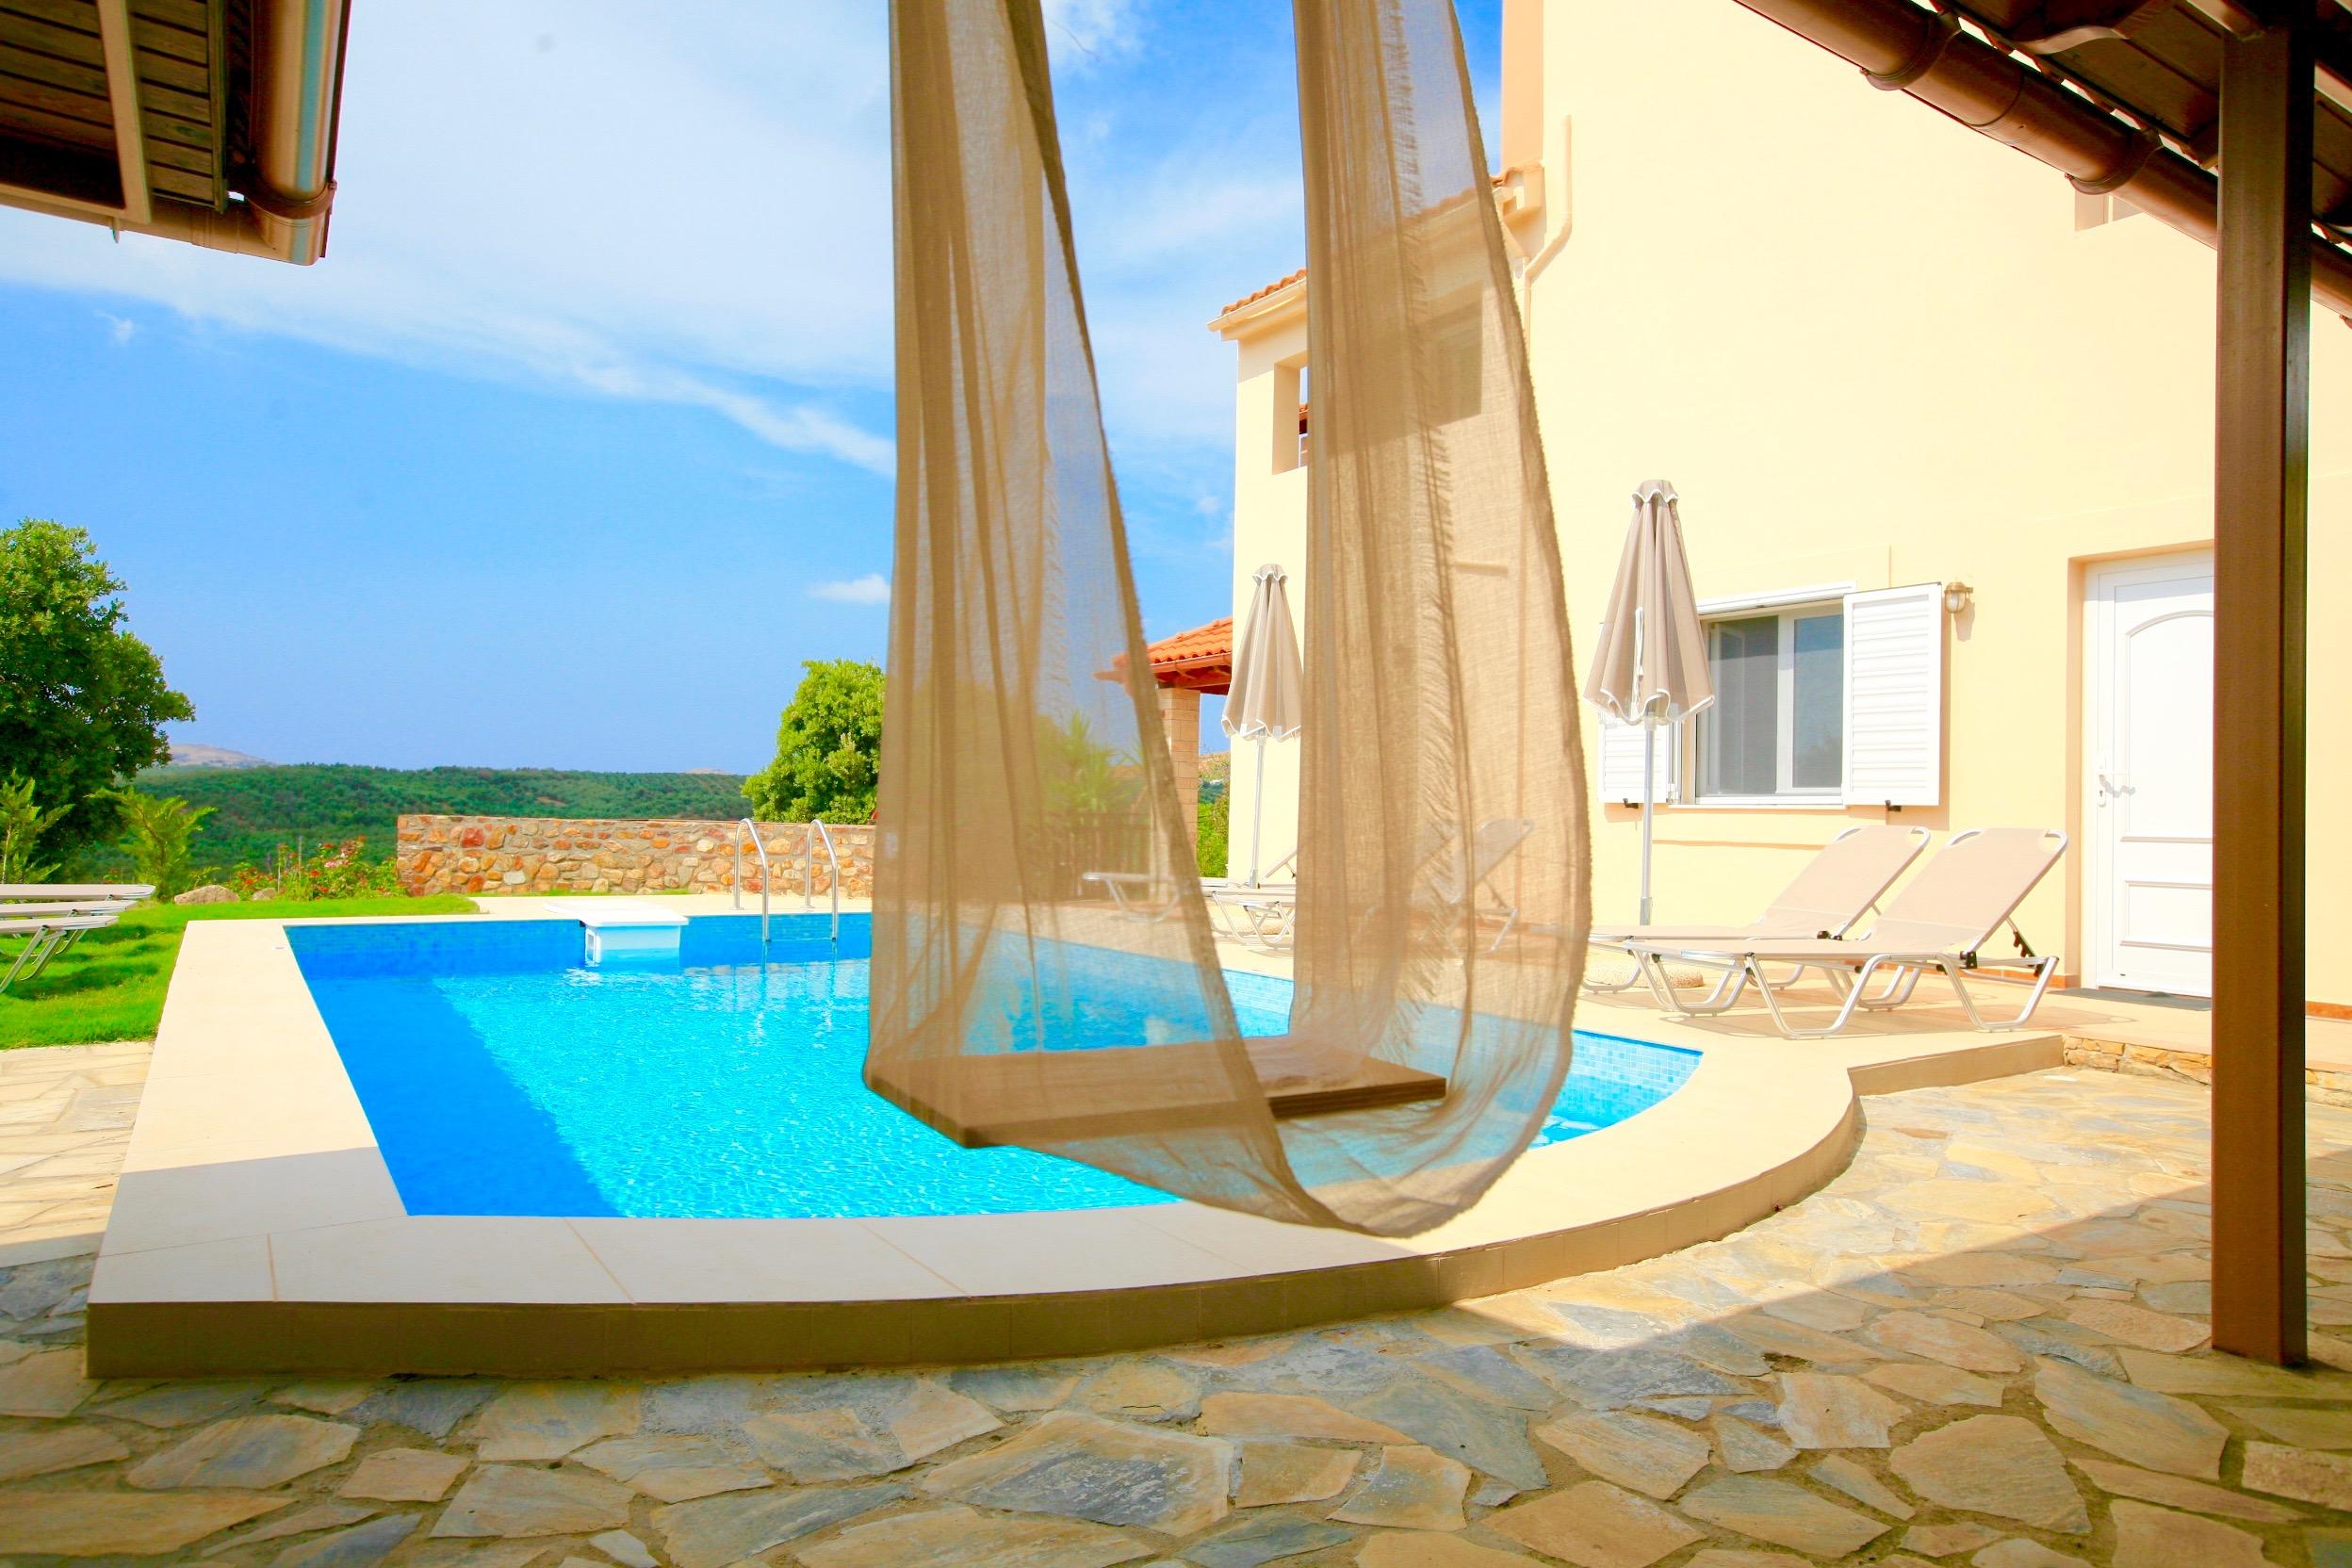 Ferienhaus Luxury Villa Korini with private swimming pool (2470495), Roumeli, Kreta Nordküste, Kreta, Griechenland, Bild 2